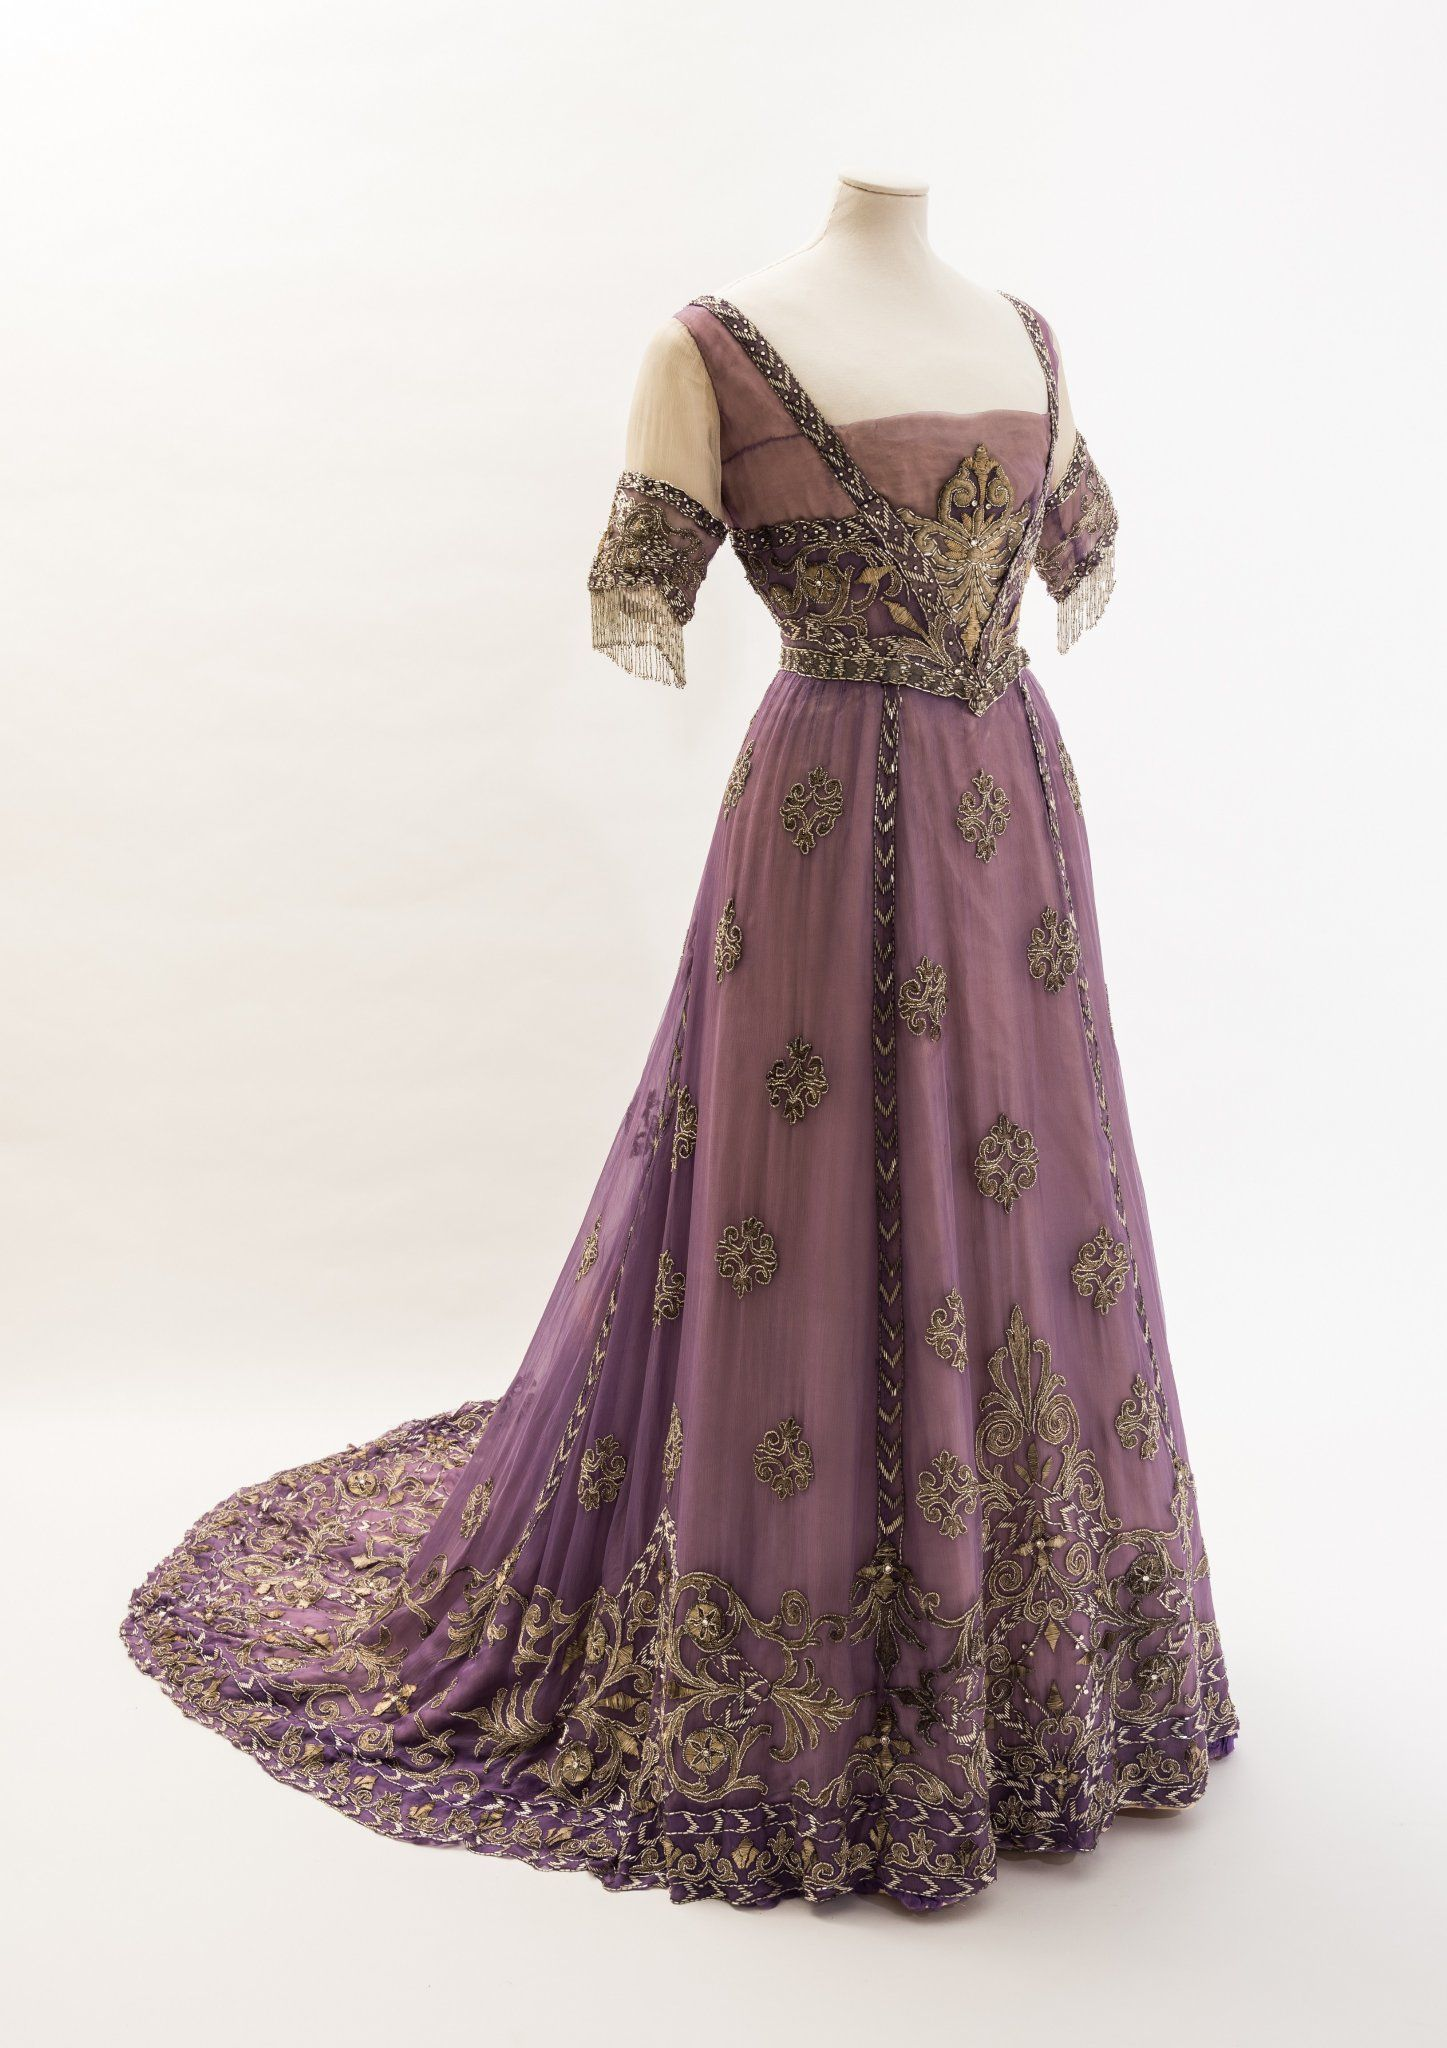 Vestidos Gamle Smukke Época De Og Moda Twitter Kjoler Vintage ZxSwgwO